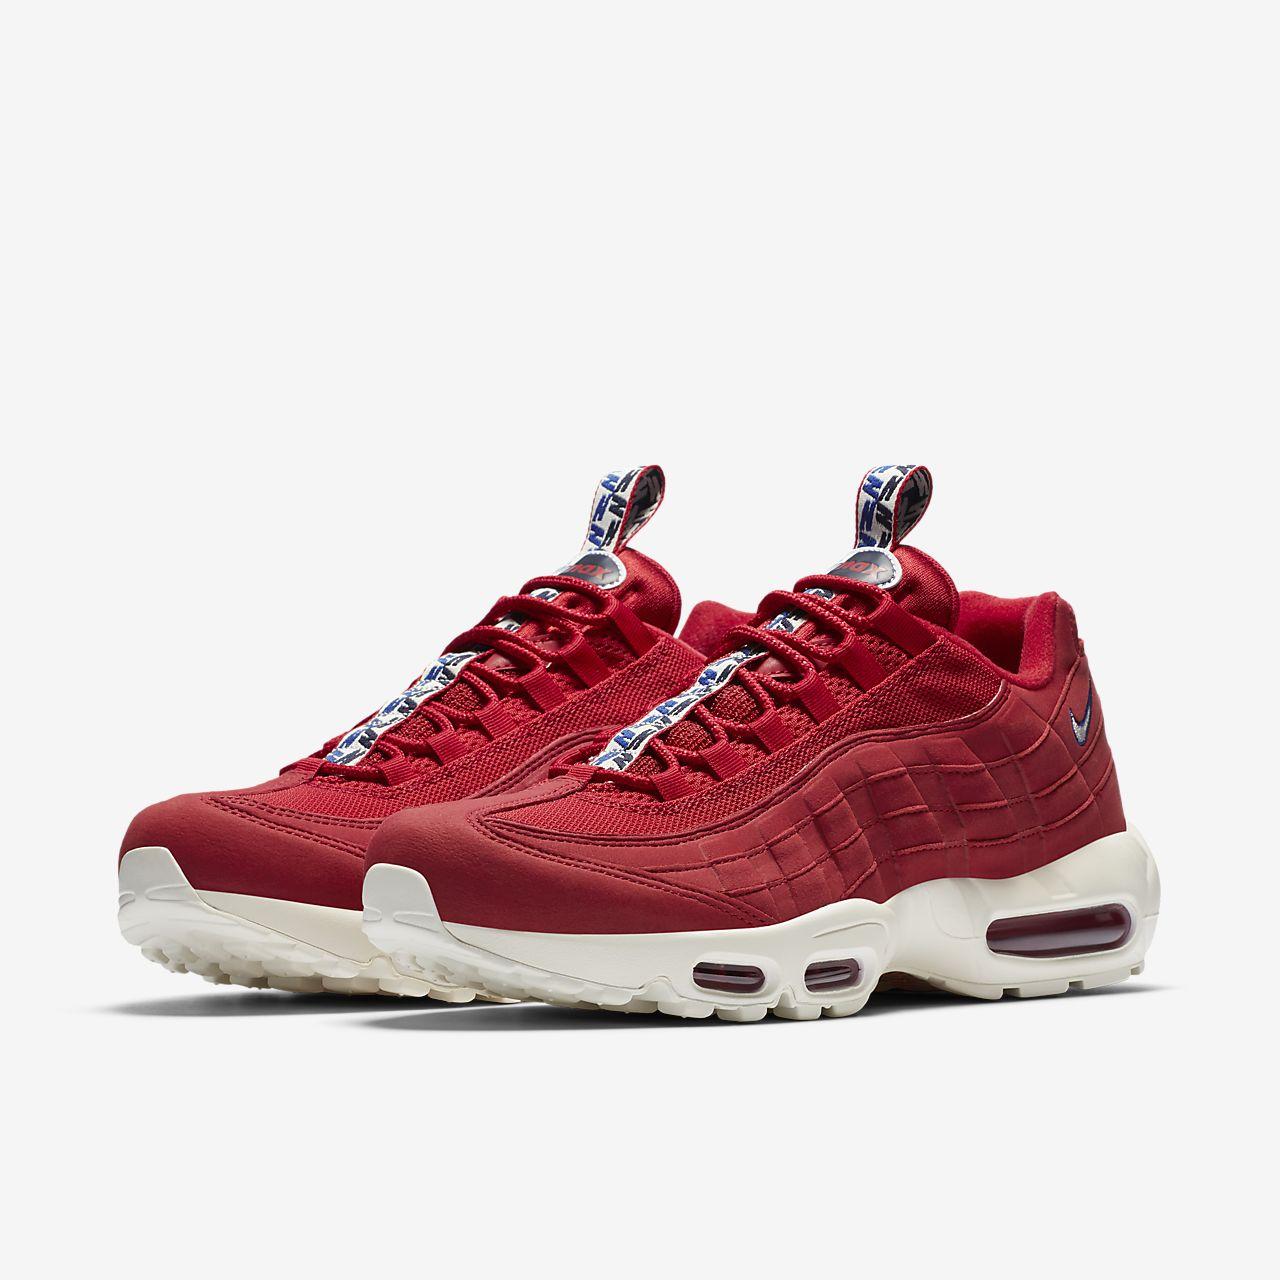 scarpe nike air max 95 uomo